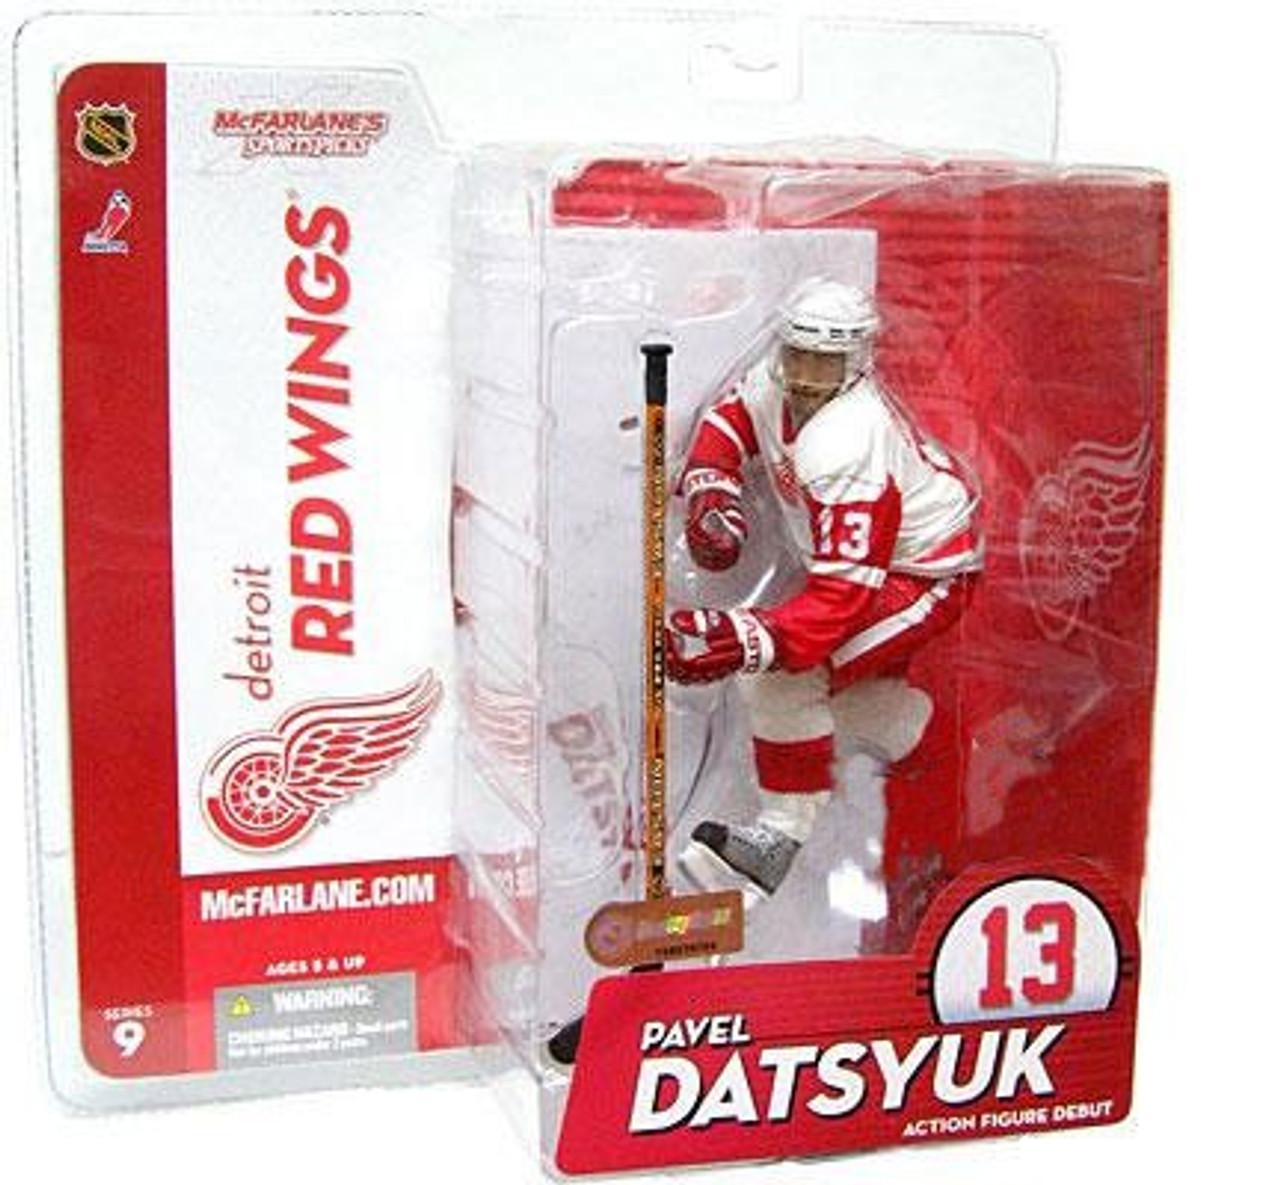 McFarlane Toys NHL Detroit Red Wings Sports Picks Series 9 Pavel Datsyuk Action Figure [White Jersey]